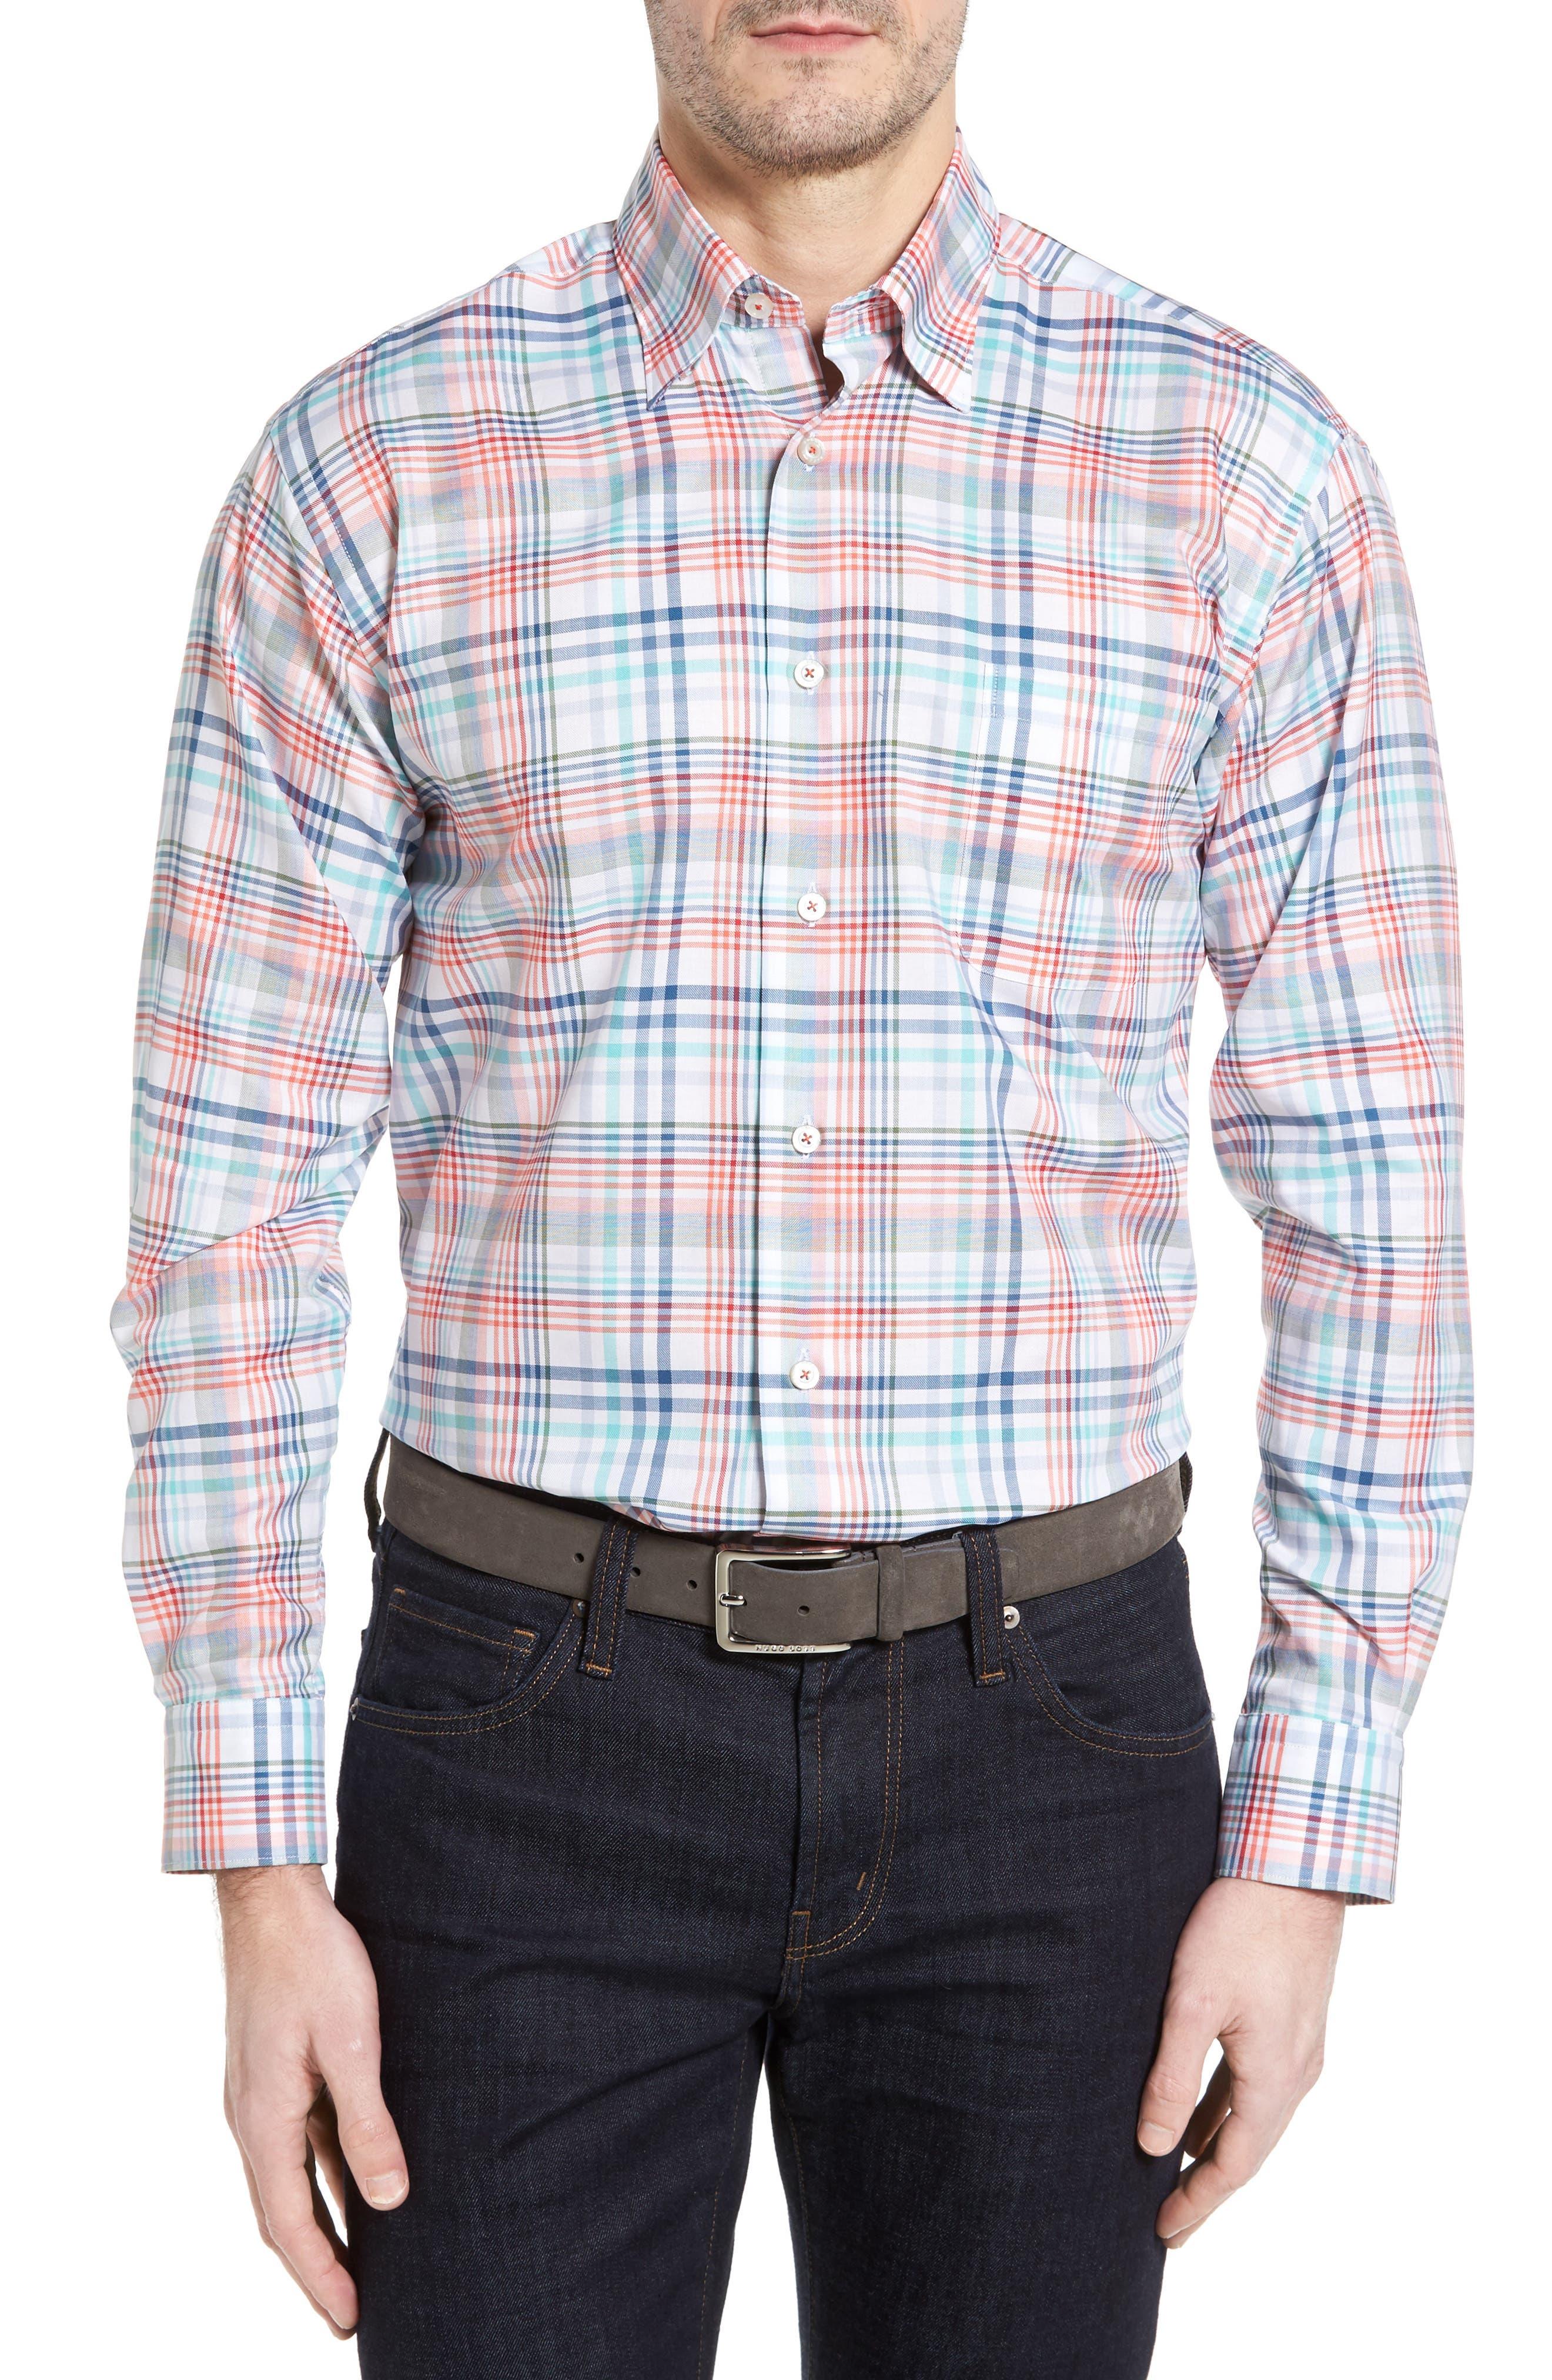 Anderson Classic Fit Plaid Twill Sport Shirt,                         Main,                         color, Orange Multi